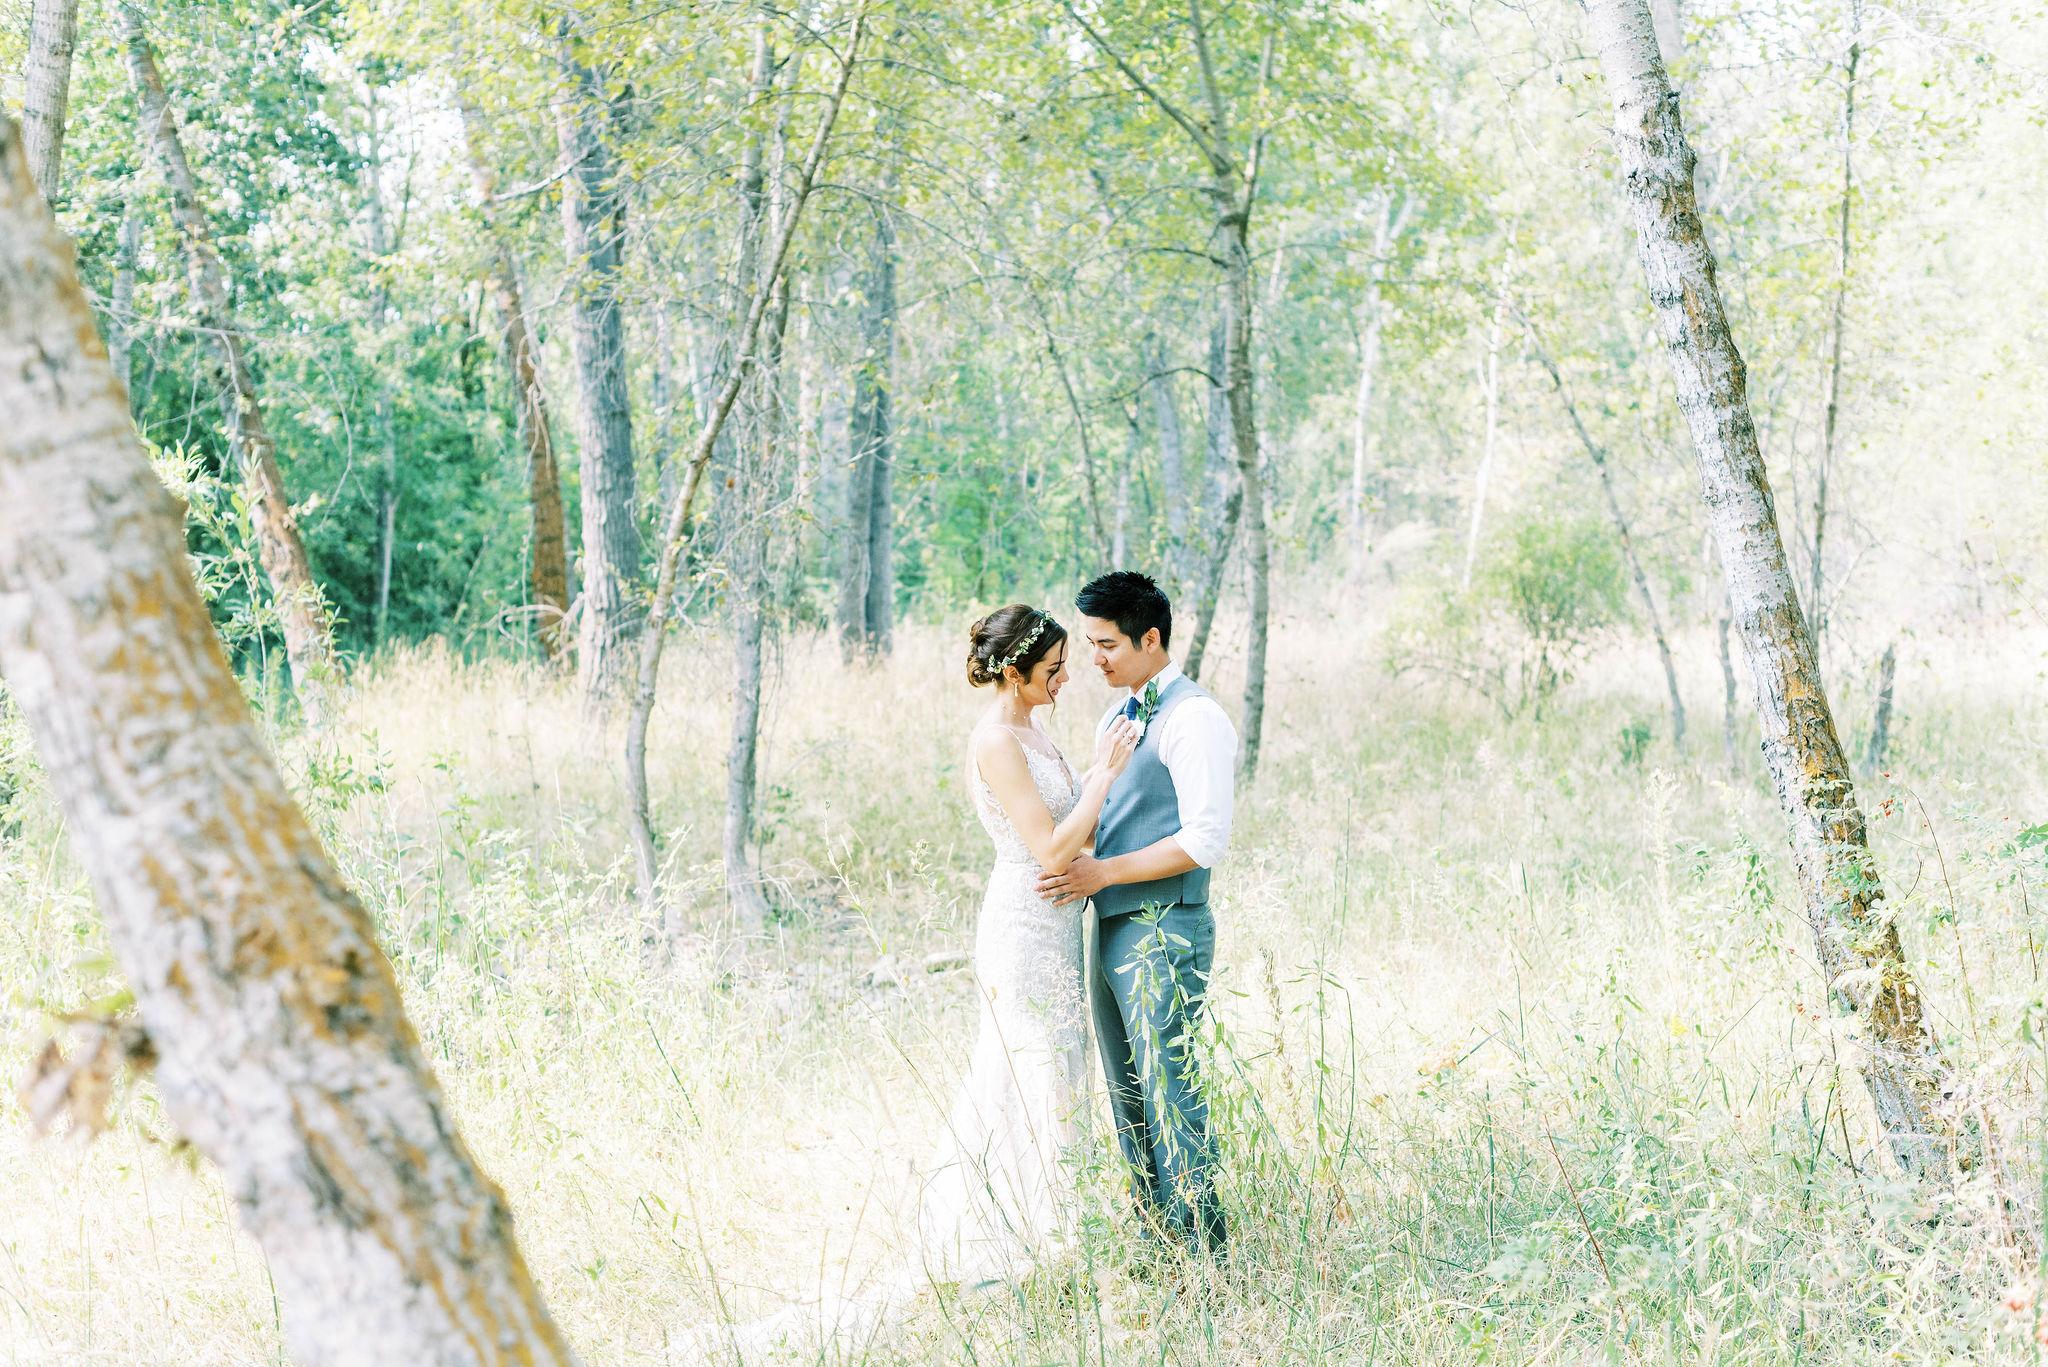 Boise_Idaho_Wedding(3of9)